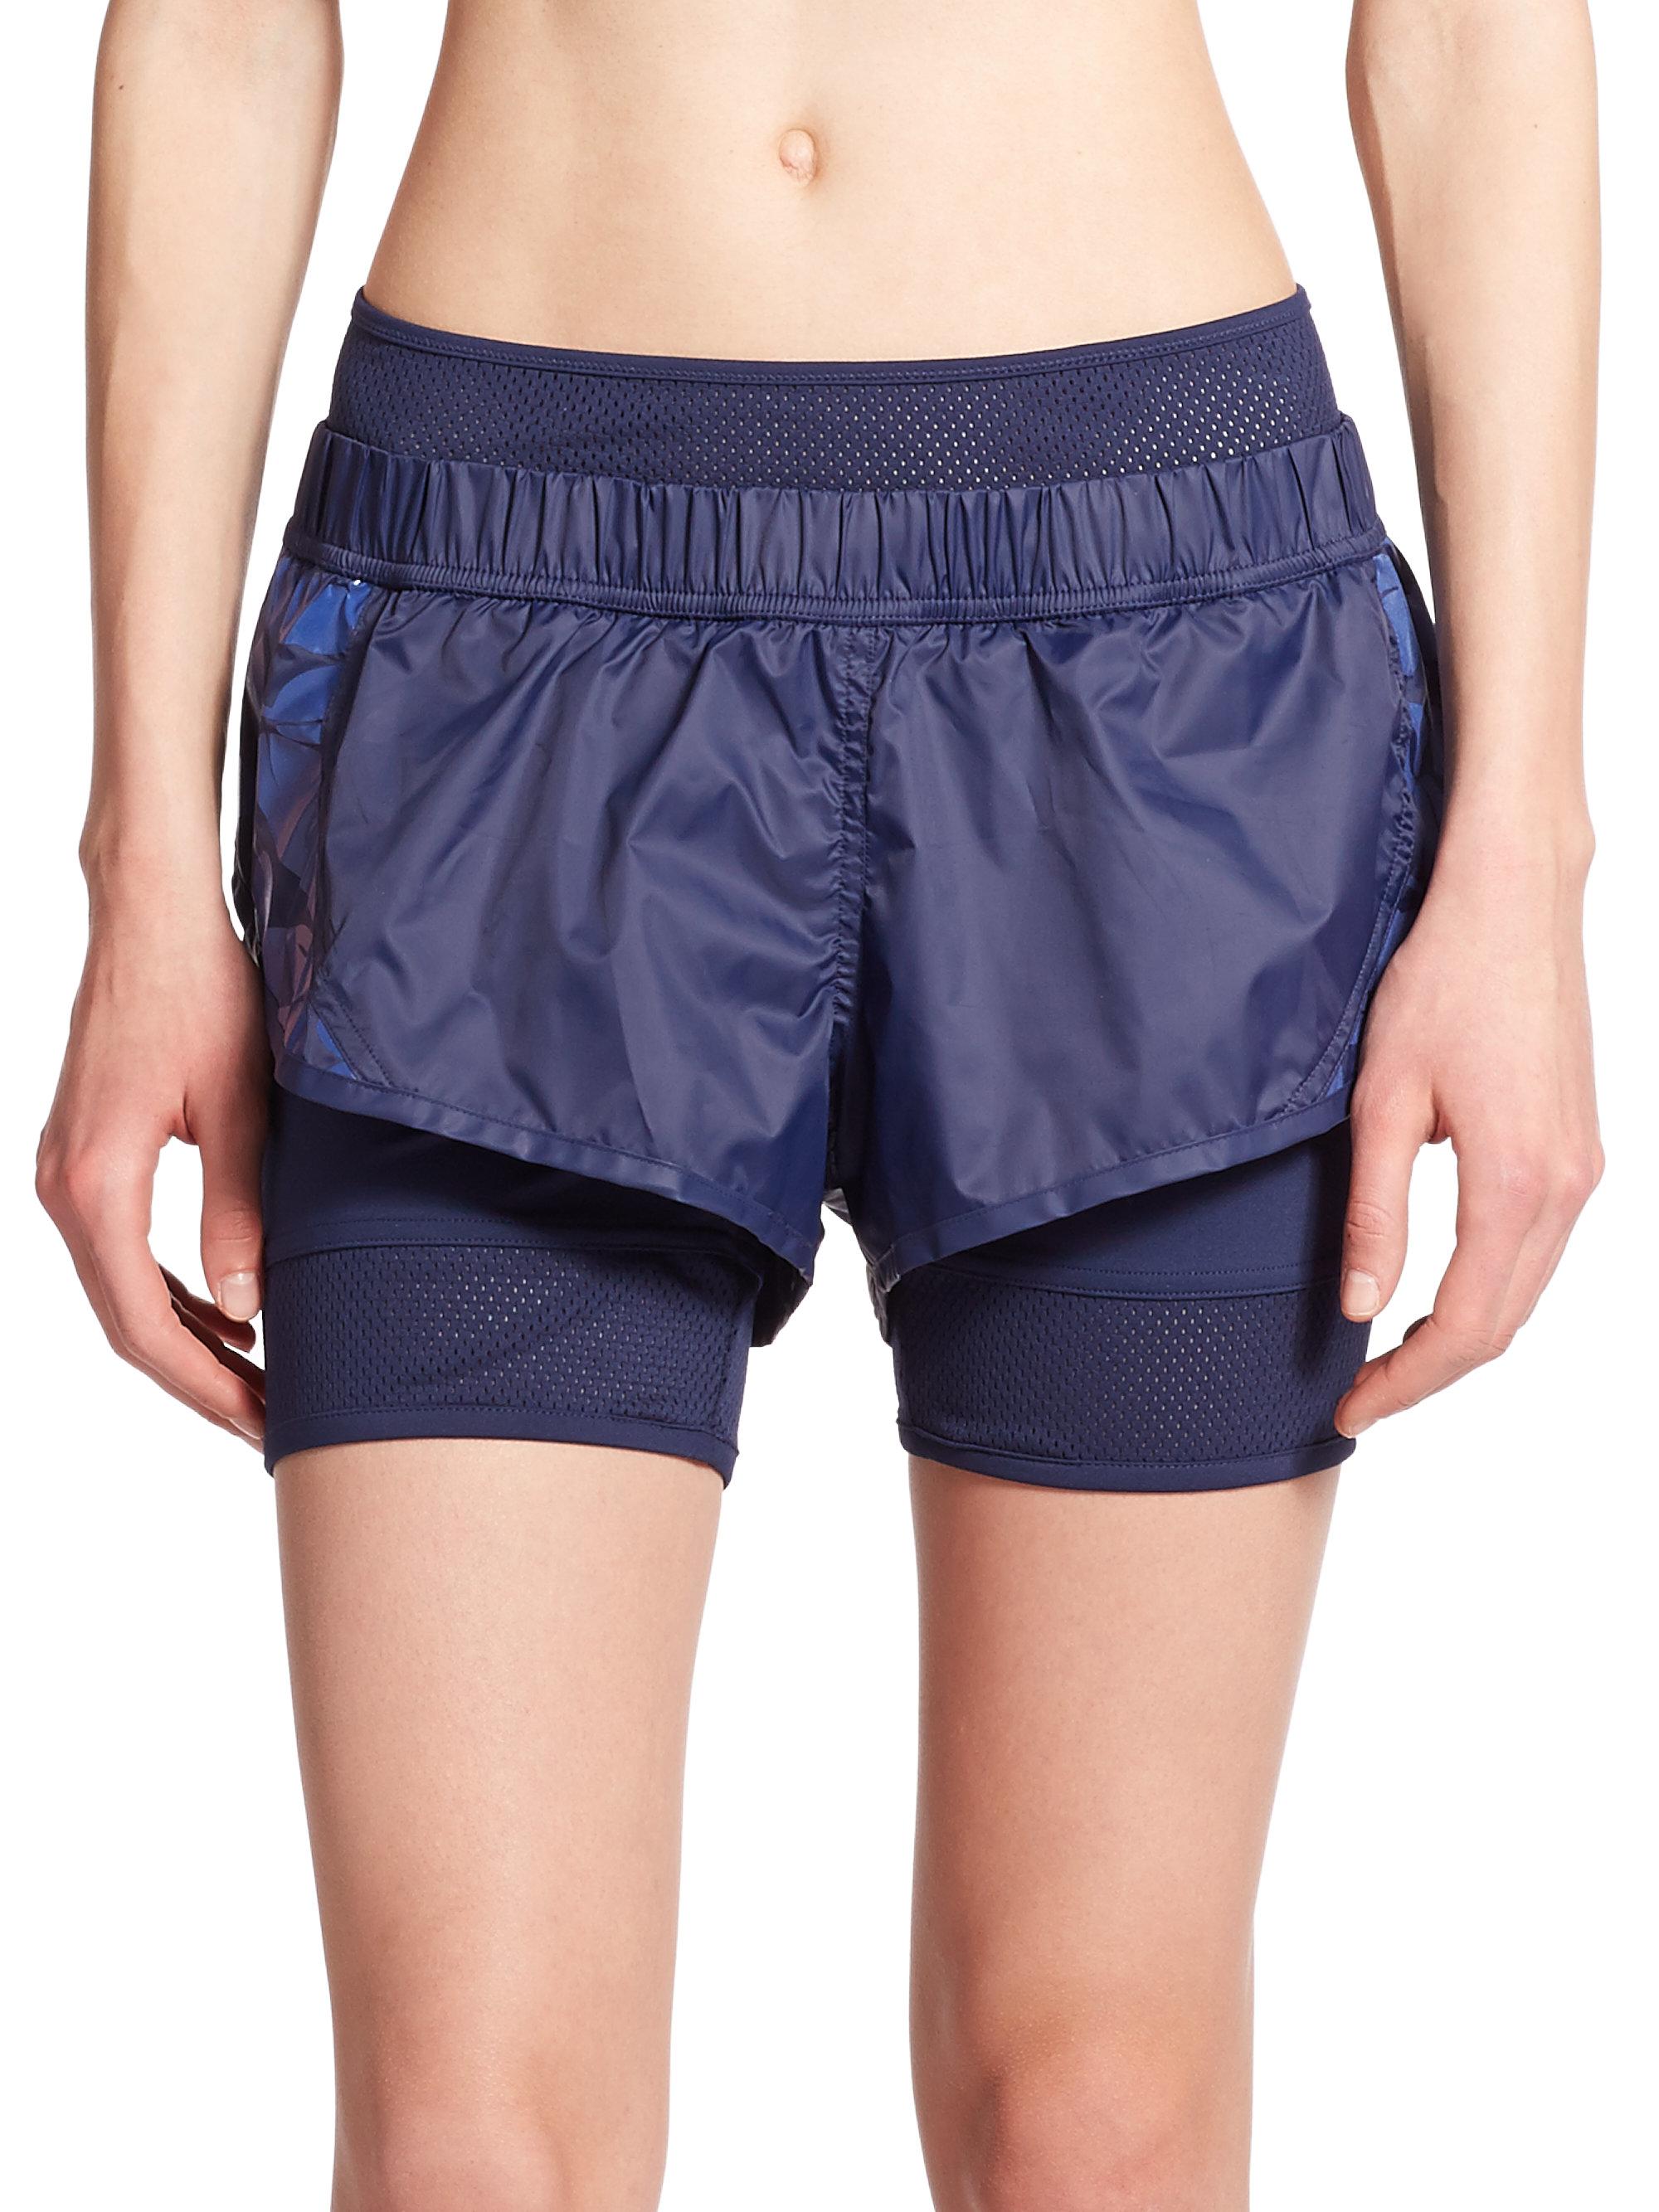 Adidas by stella mccartney Woven Mini Running Shorts in ...